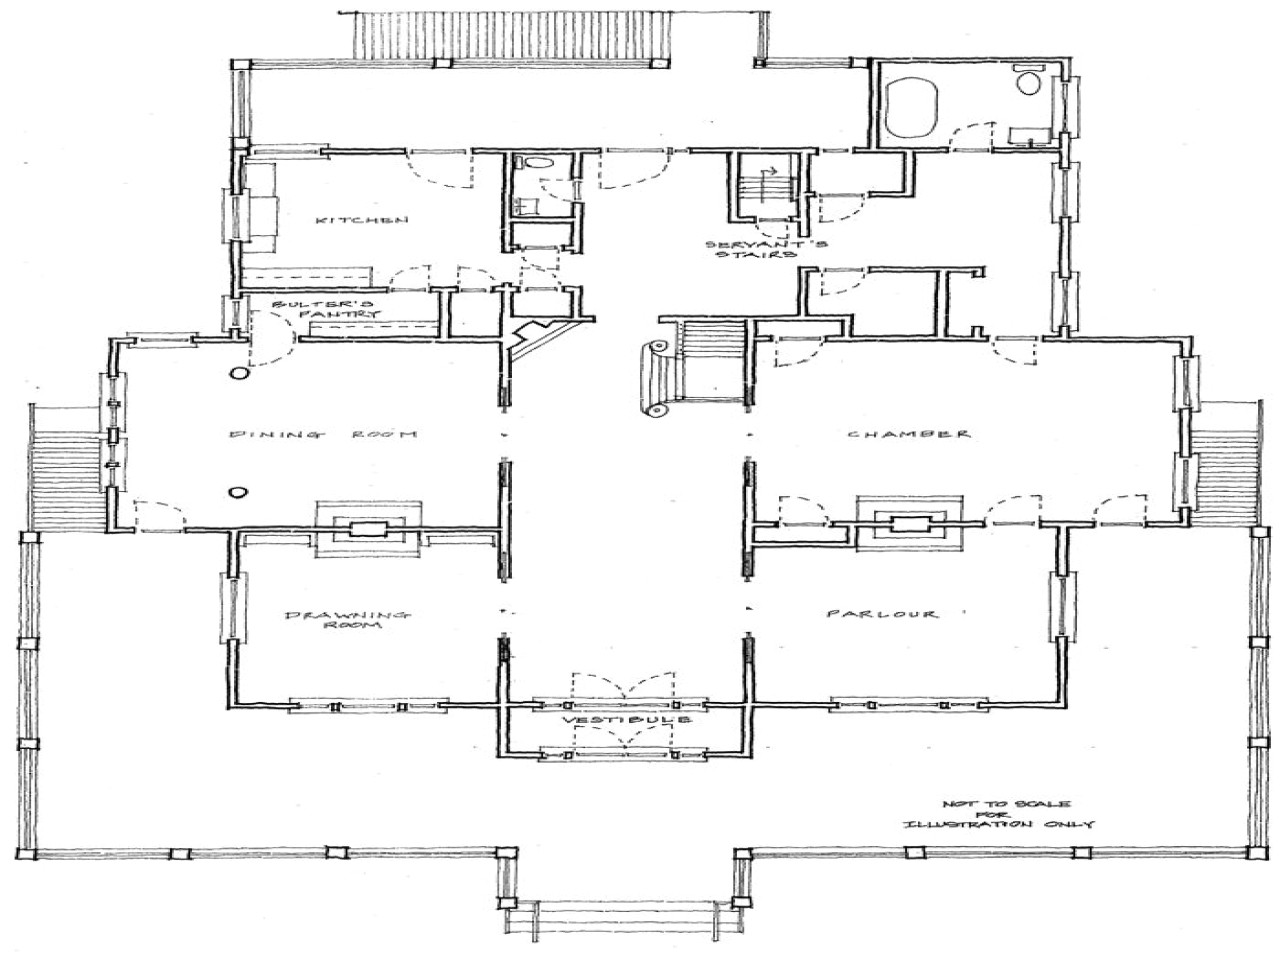 2c05b969391f3ffb two story luxury home floor plans historic home floor plans